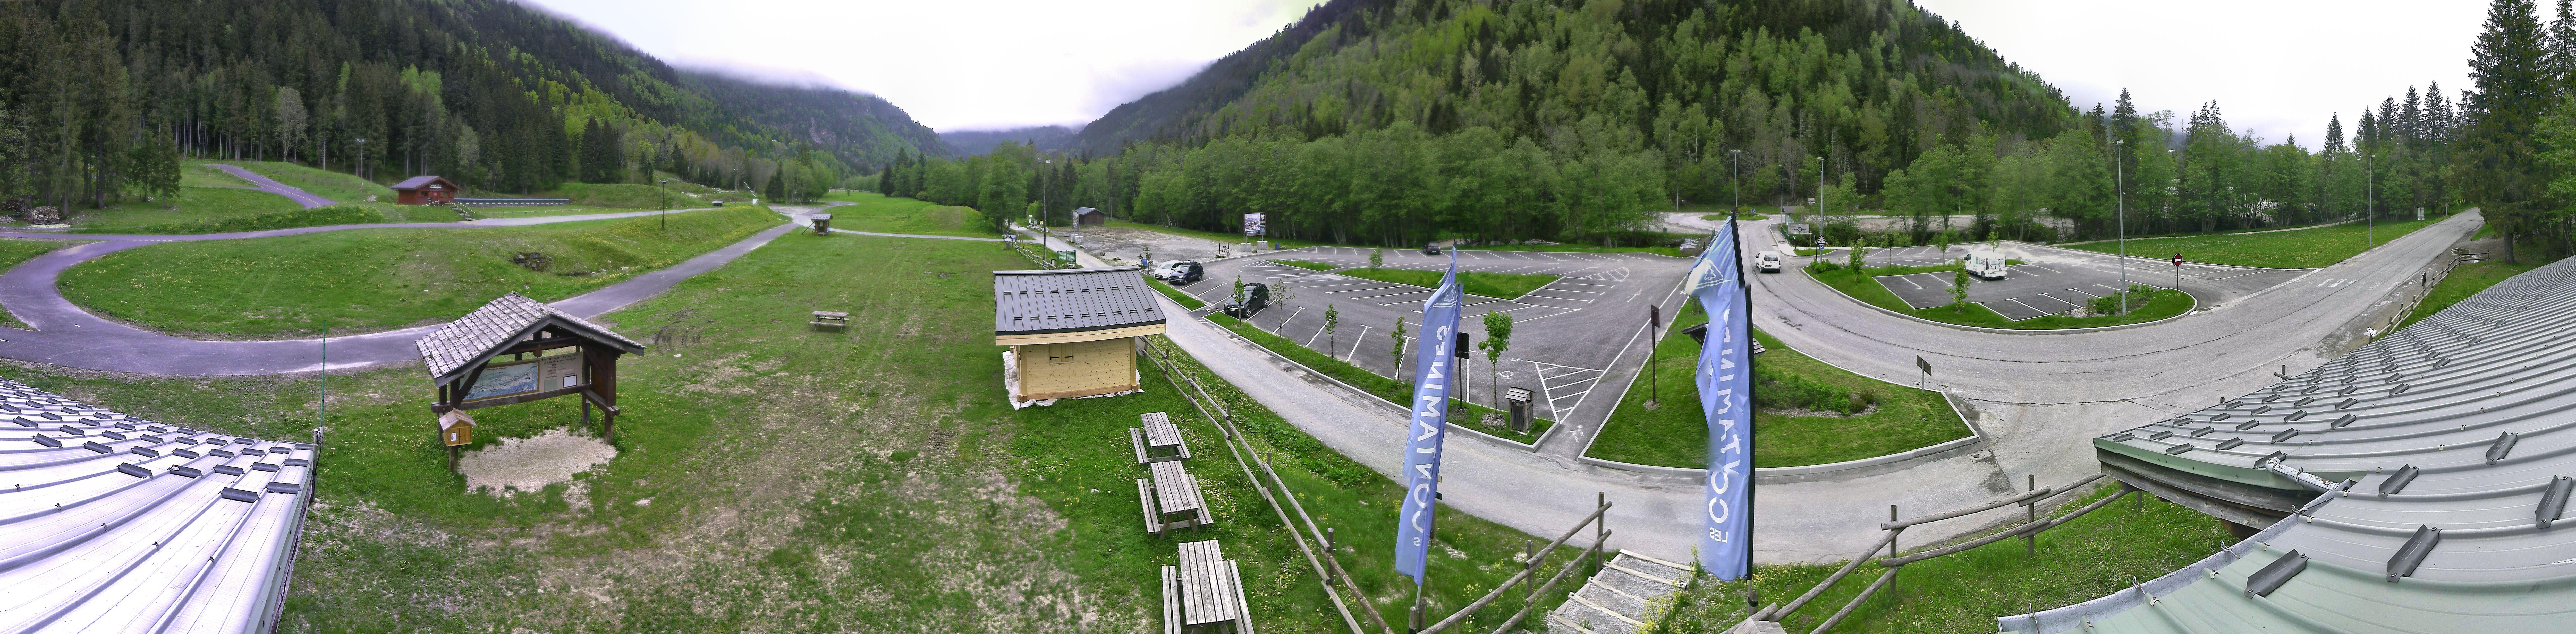 Nordic Park